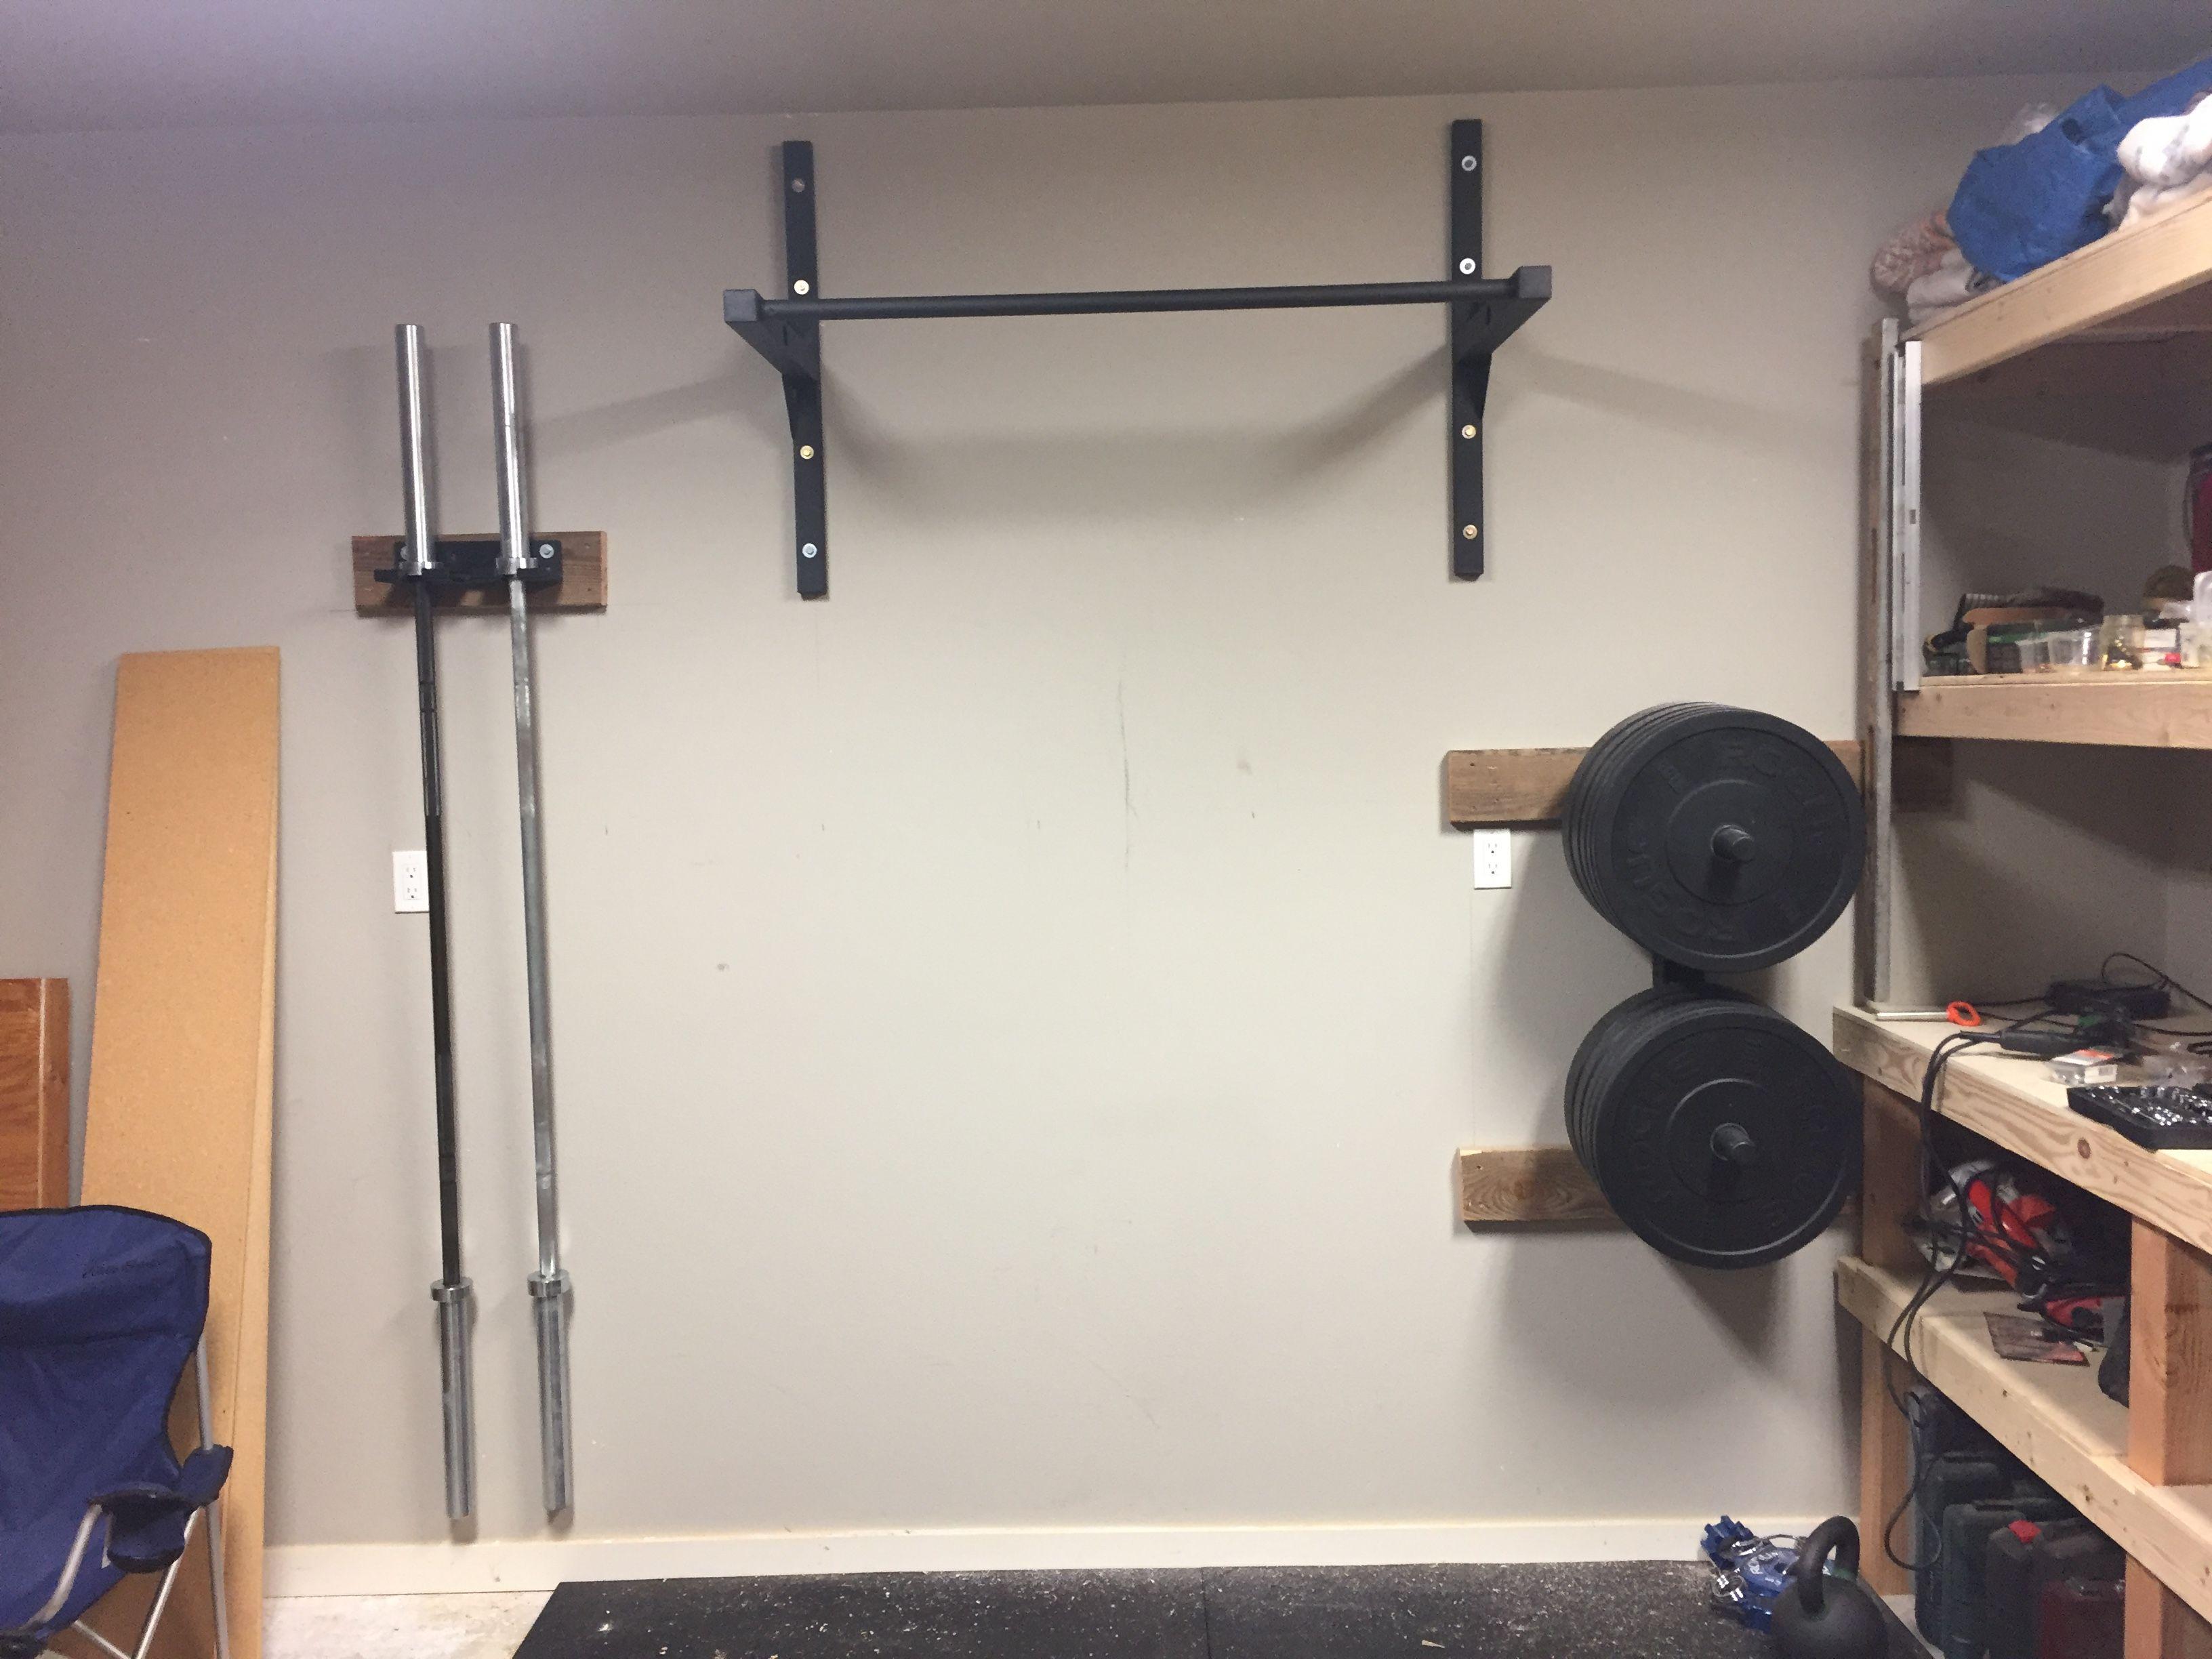 Stud Bar Ceiling Or Wall Mounted Pull Up Bar Diy Home Gym Gym Room At Home Diy Garage